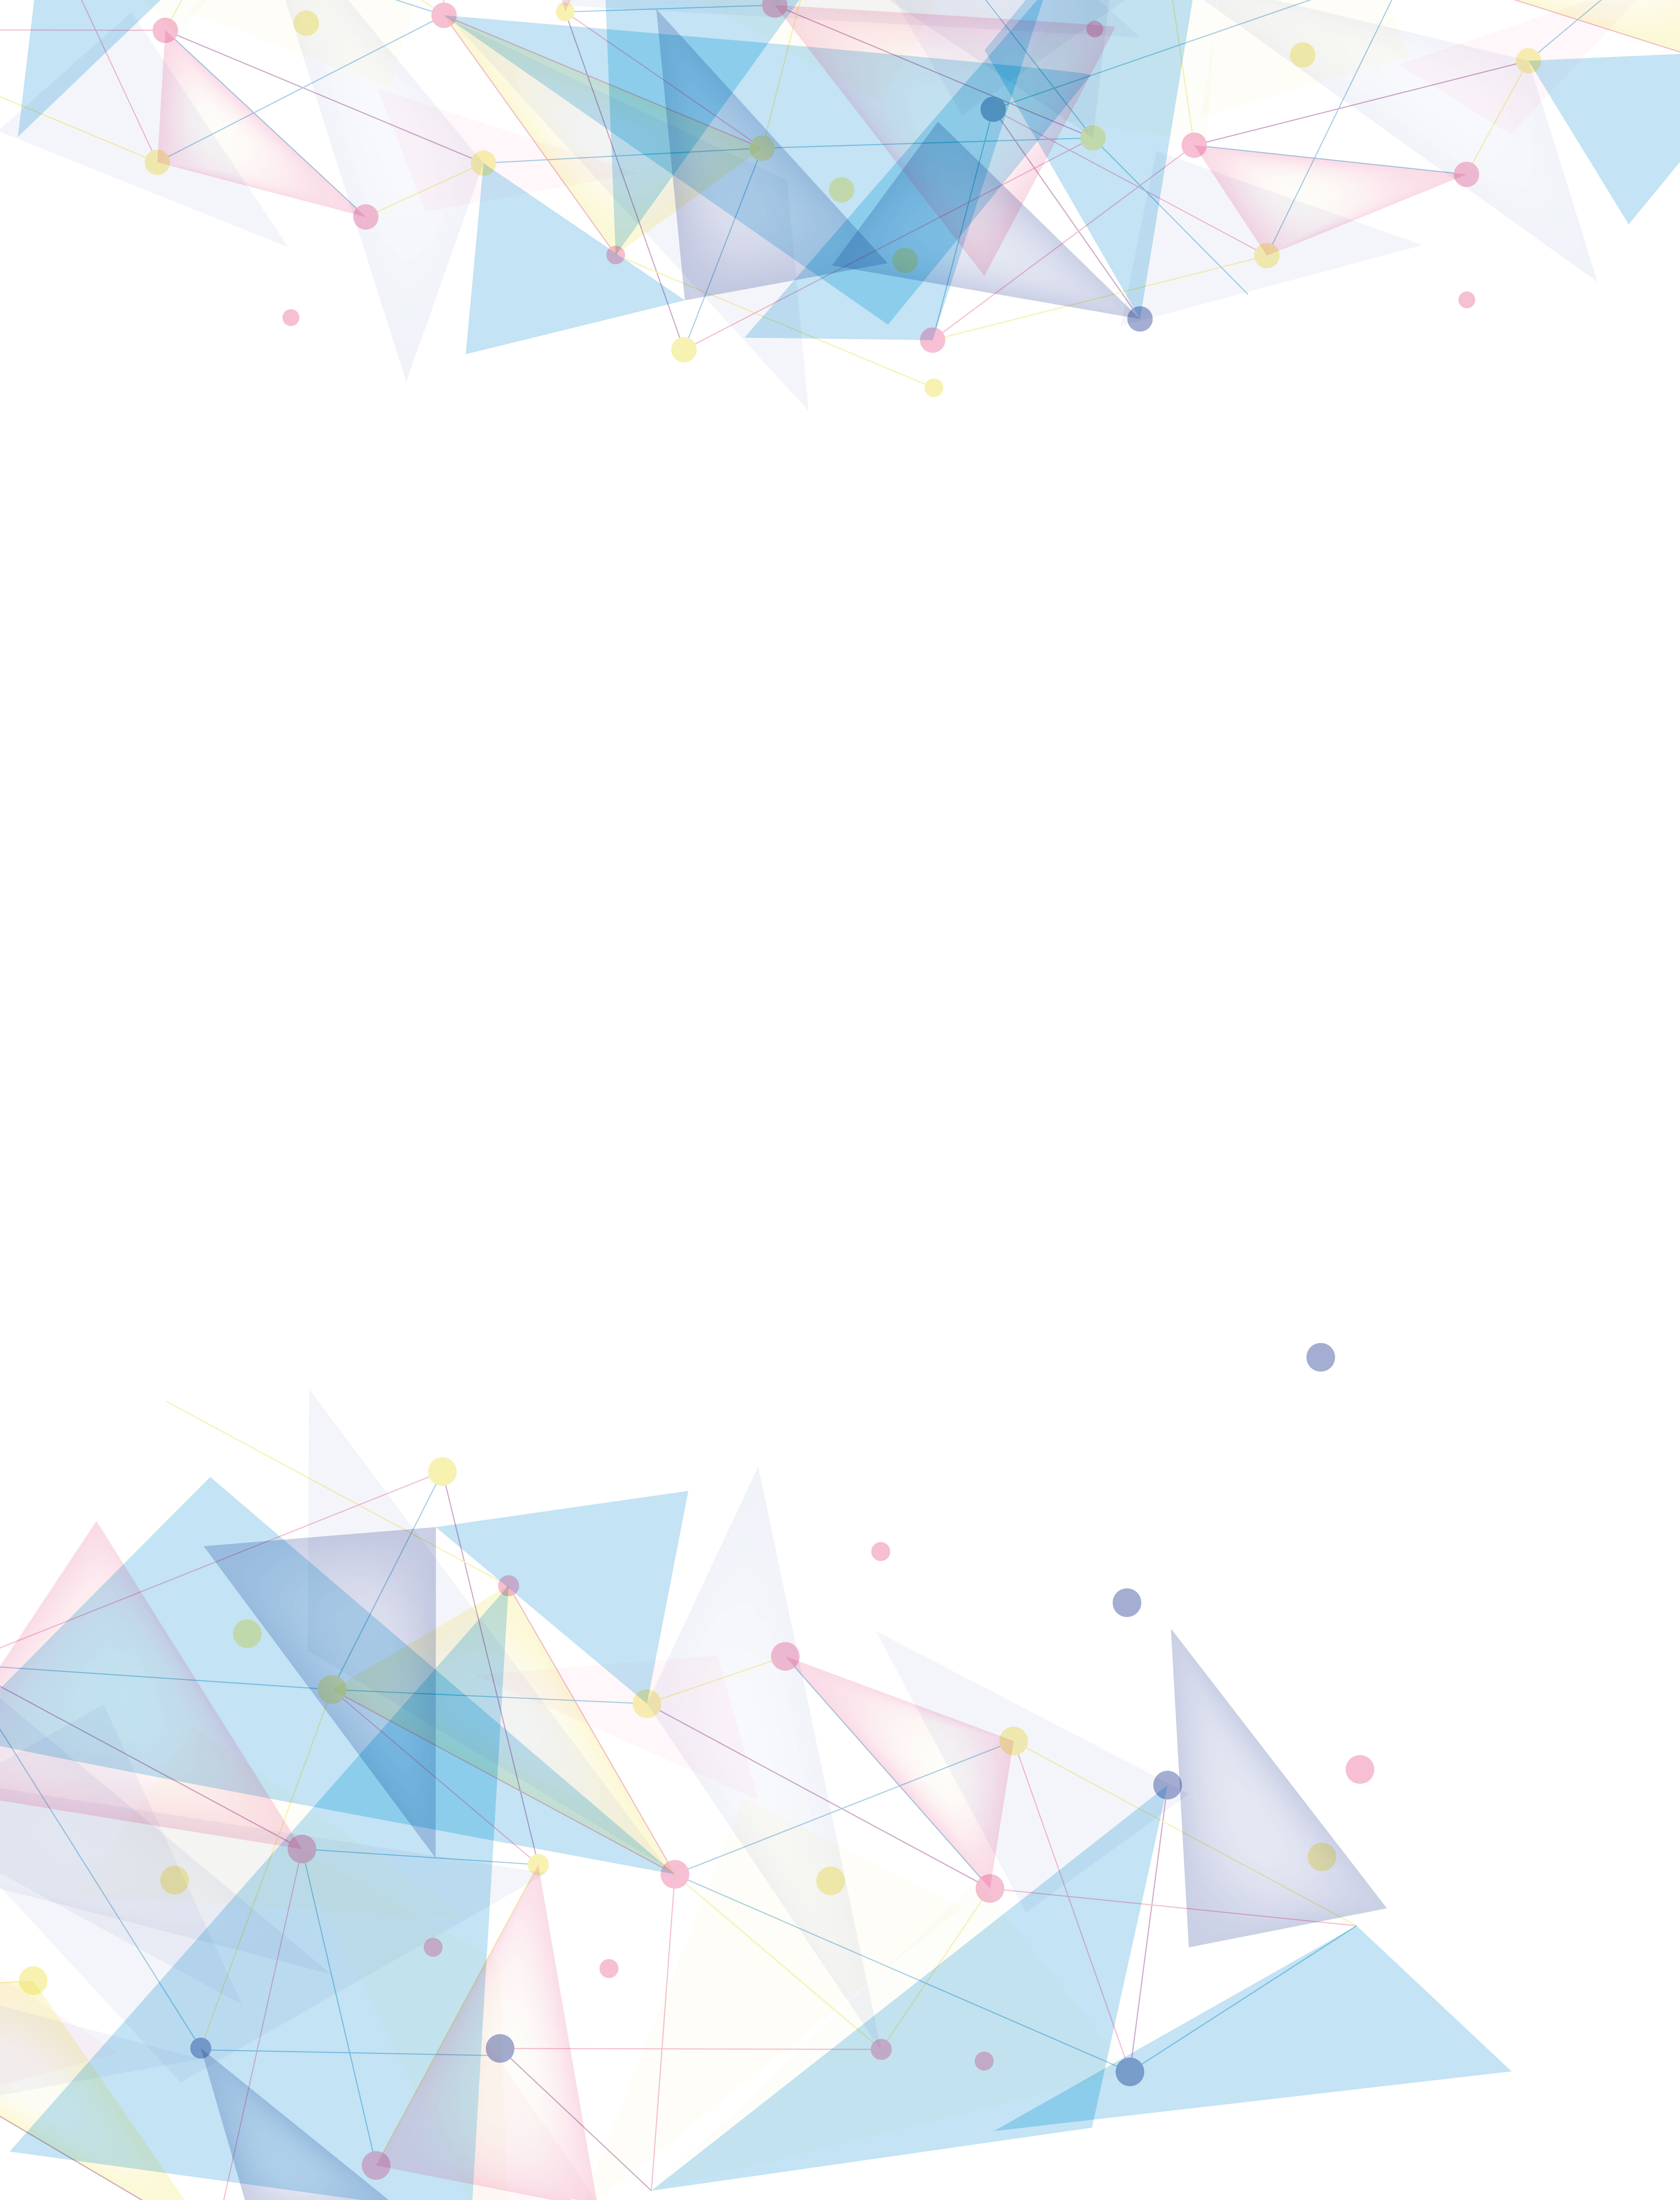 Calendar Templates Html : Small fresh colorful vector geometric background debris